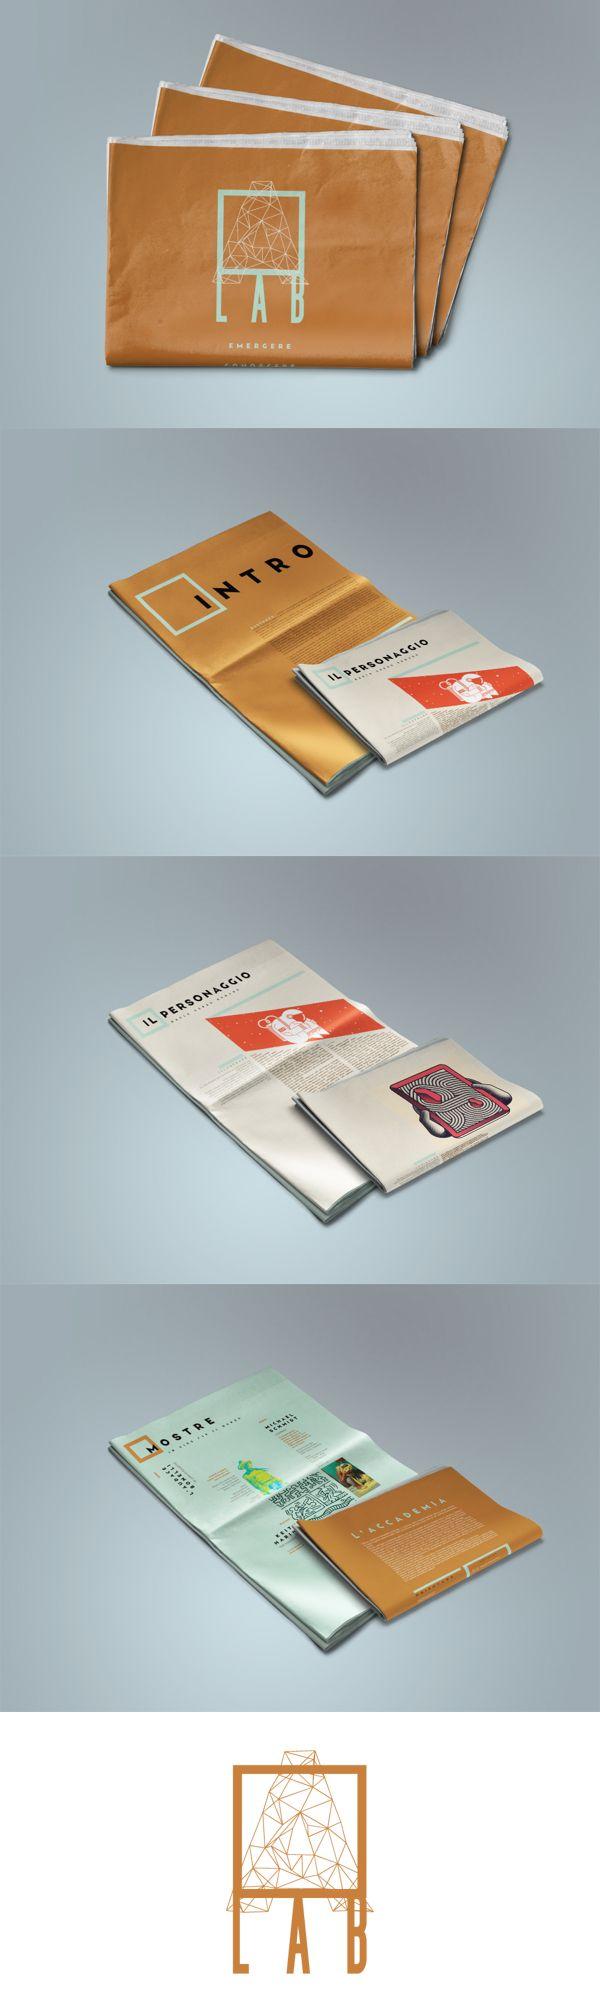 A Lab | Tabloid Editorial Design, Graphic Design, Typography  Marta Coppola